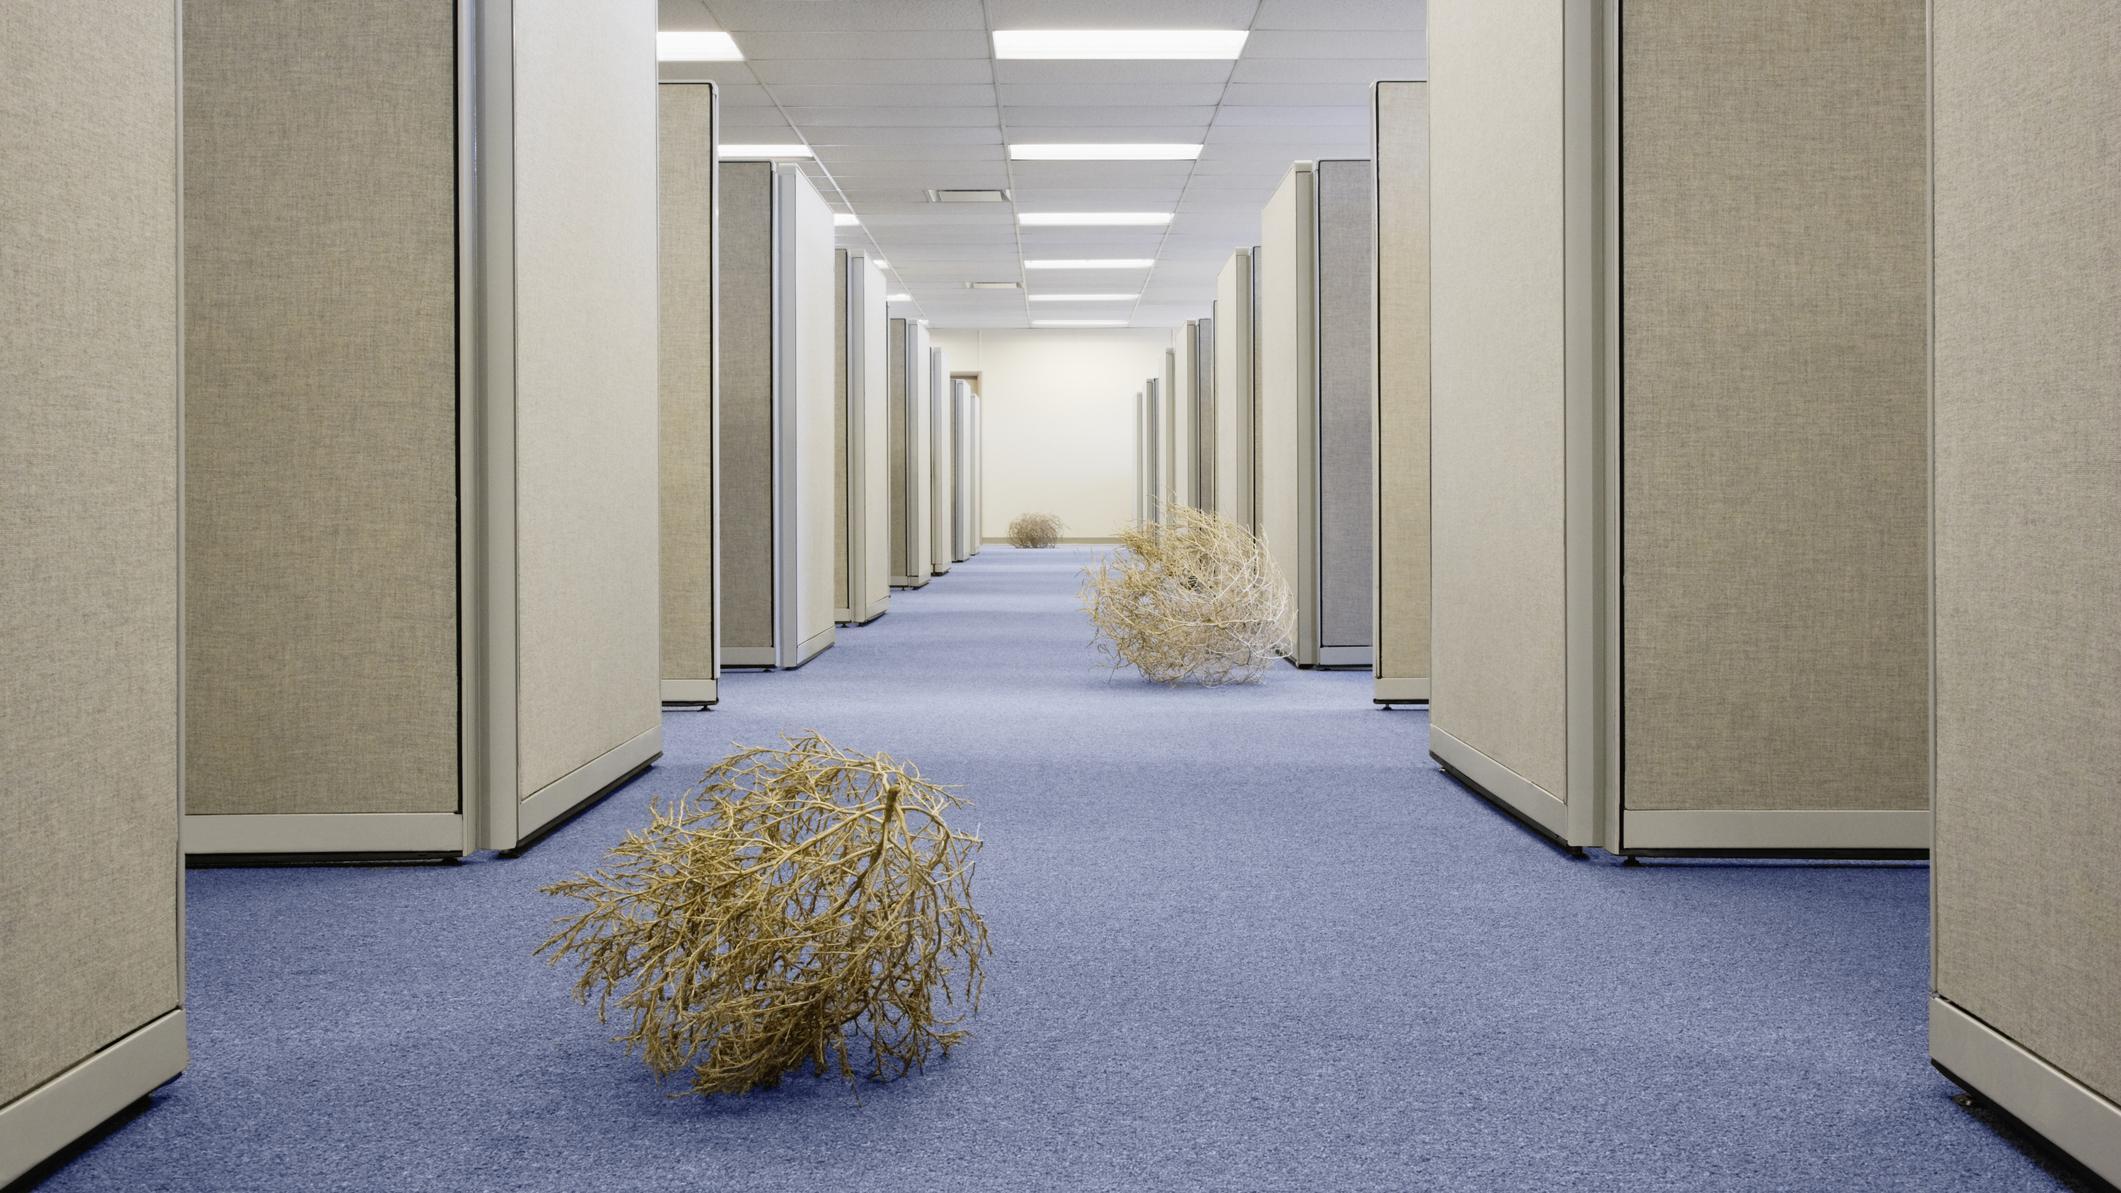 Tumbleweed in the hallway